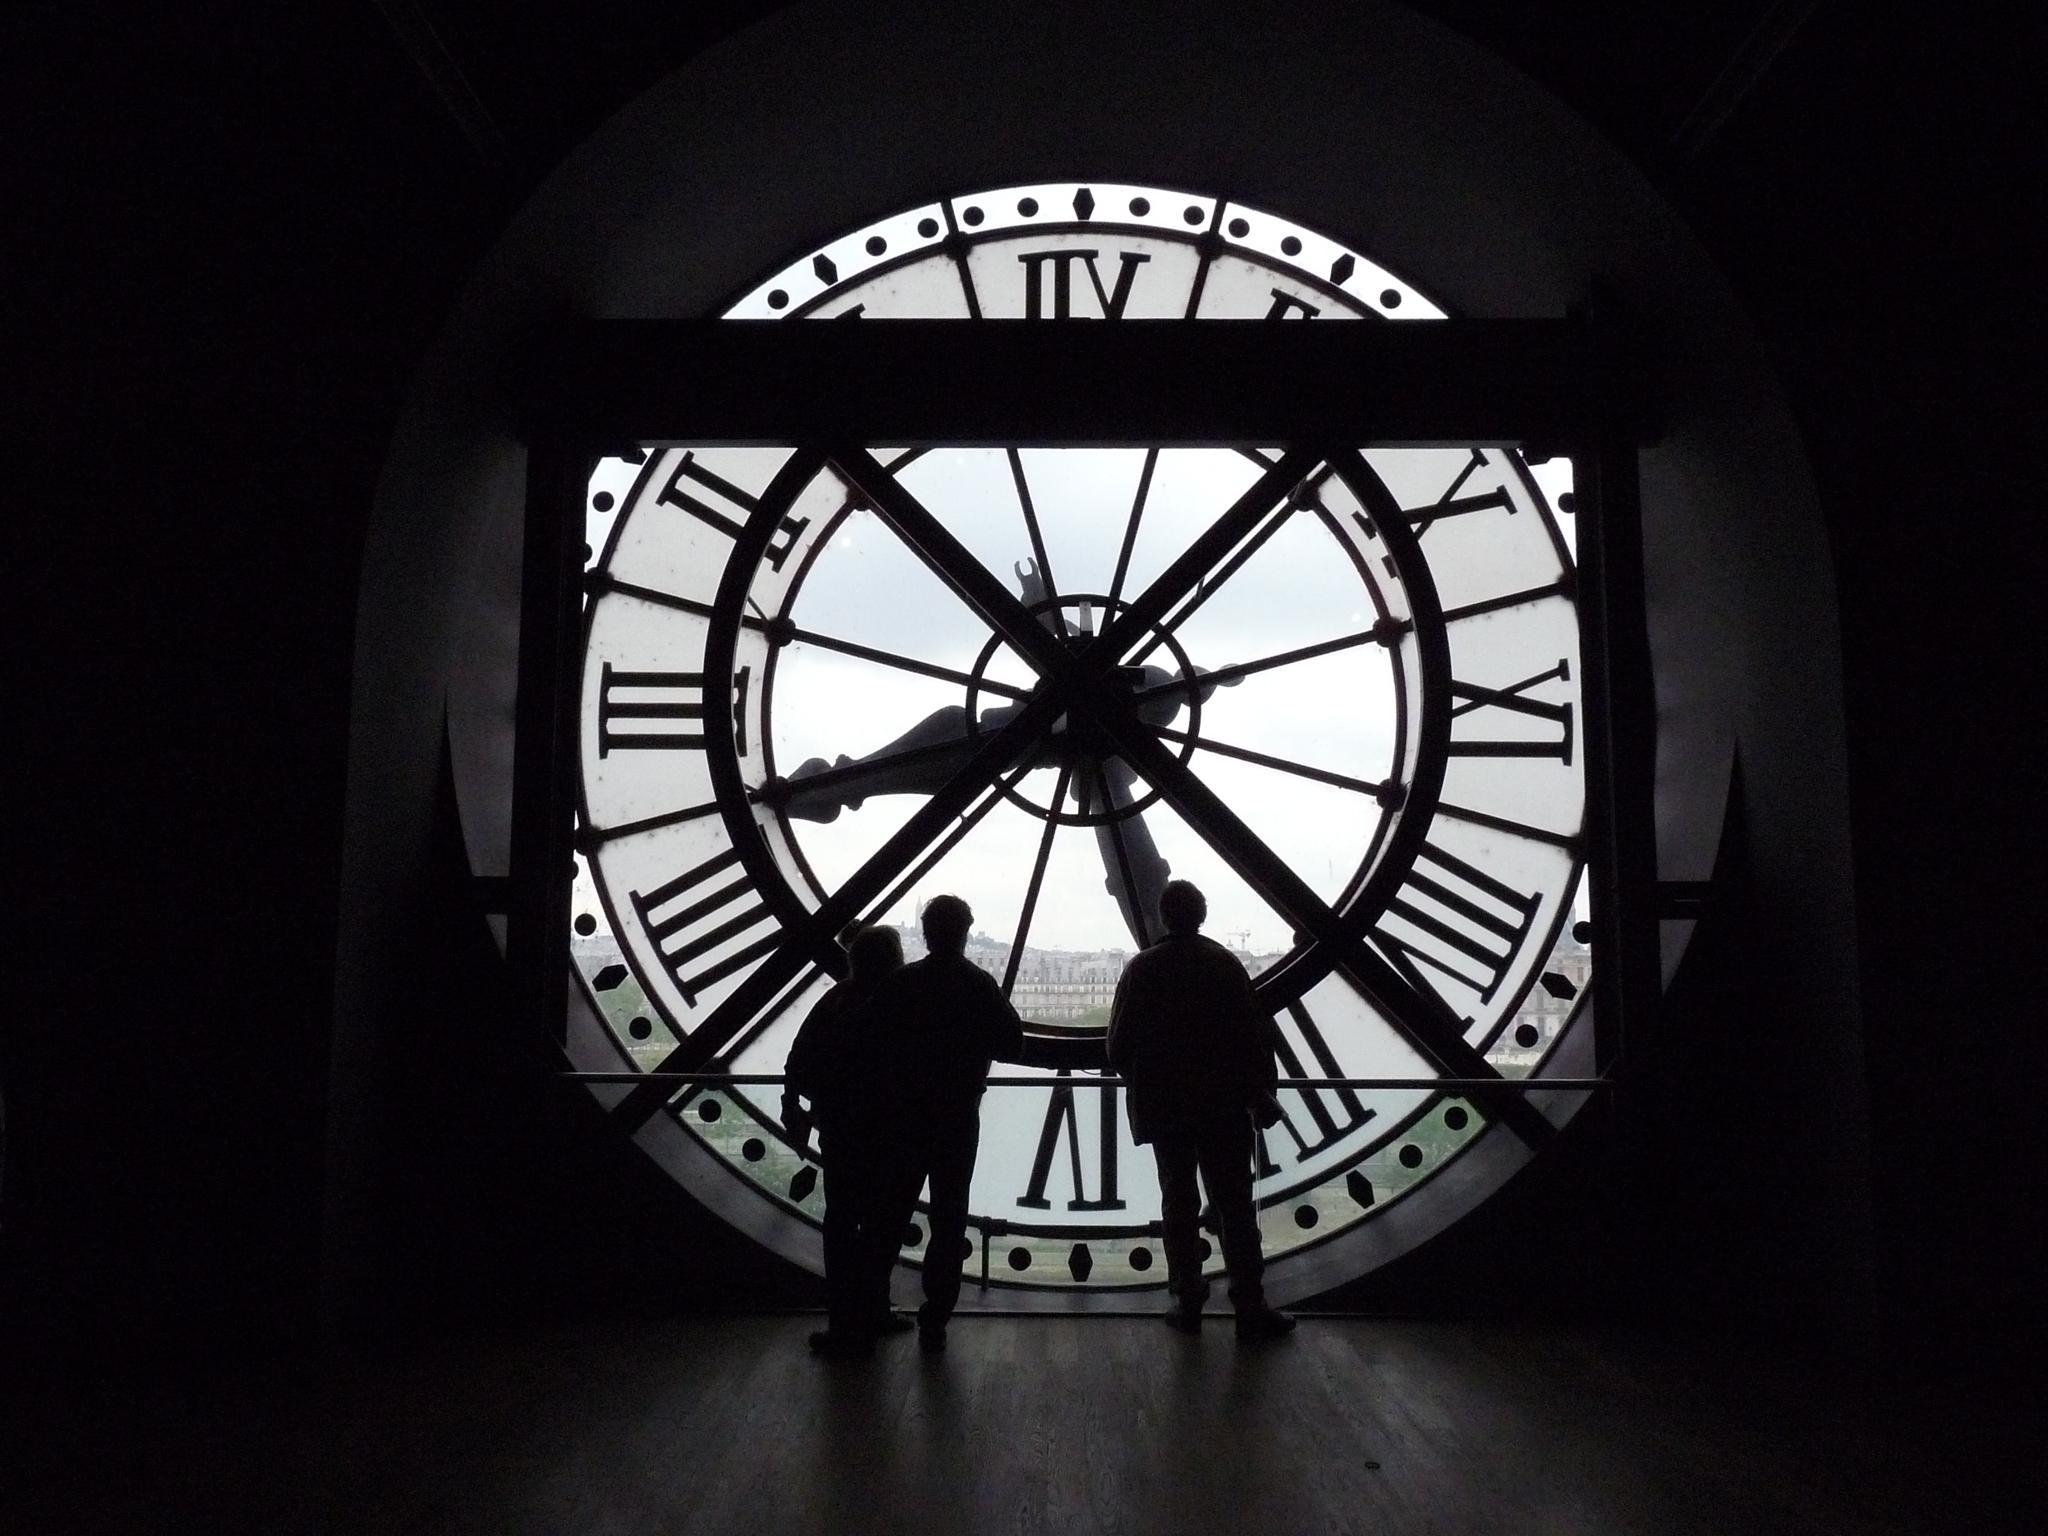 Paris April 2014 by Maria Holmin